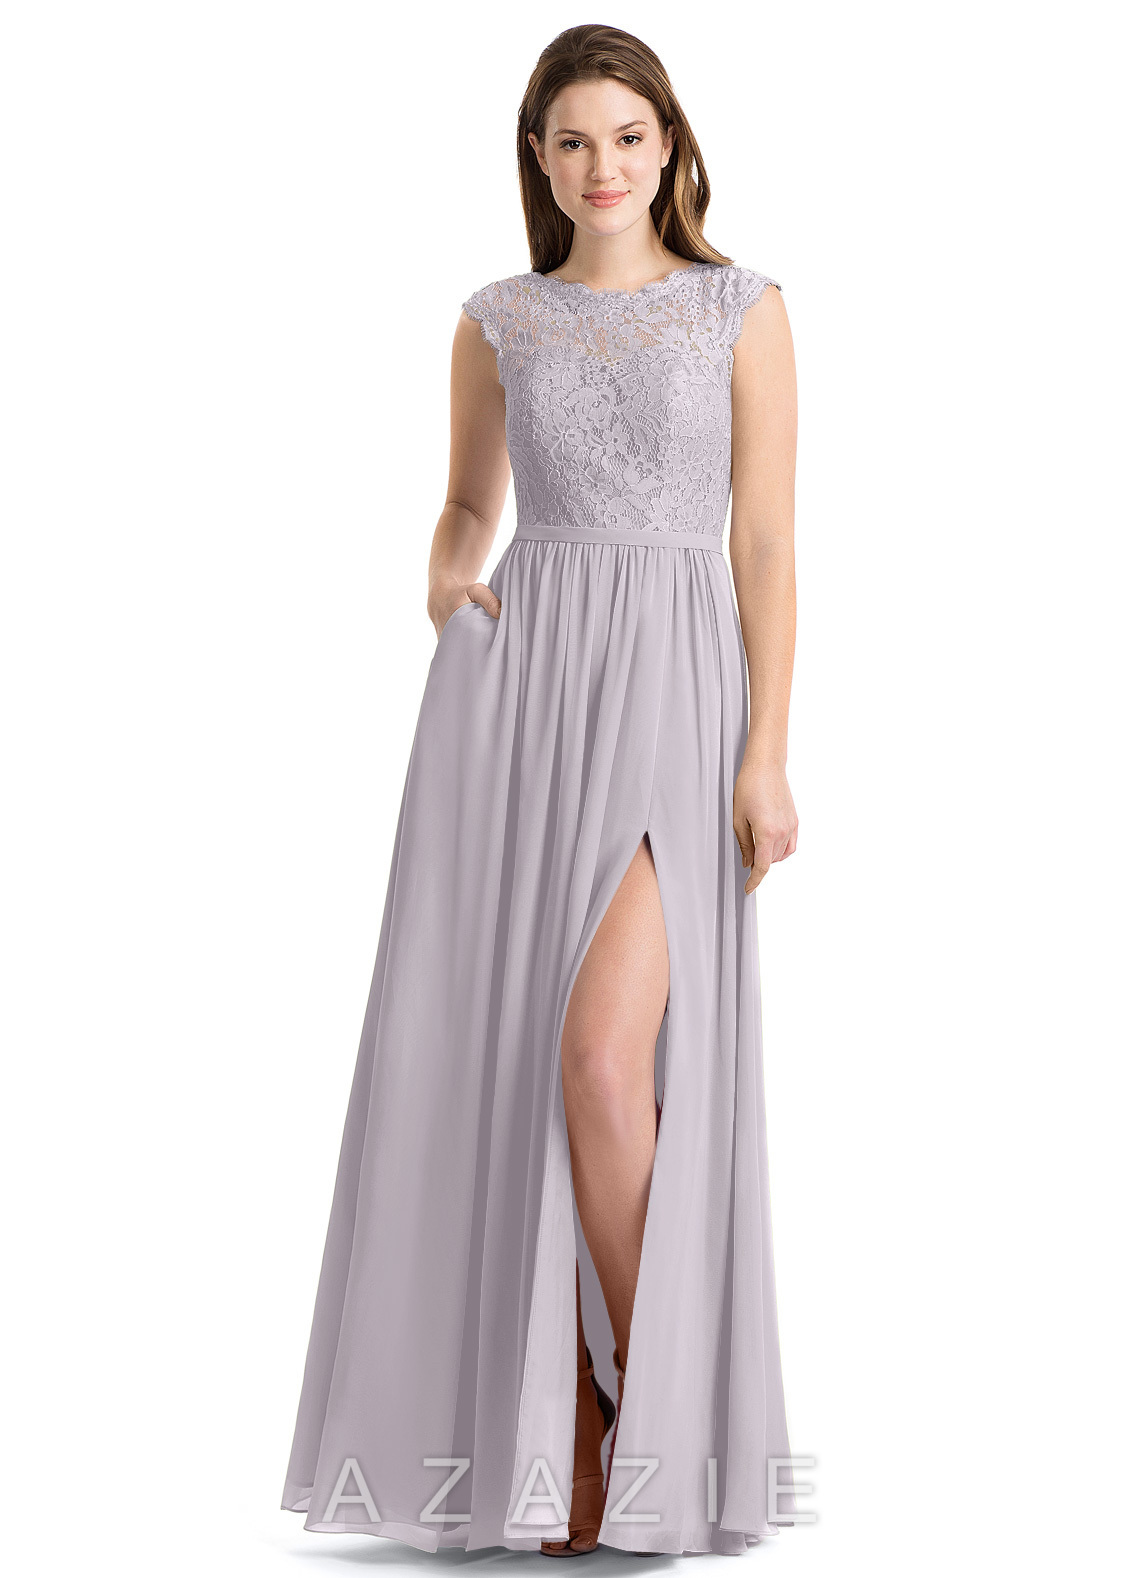 77563500b6 Azazie Arden Bridesmaid Dress